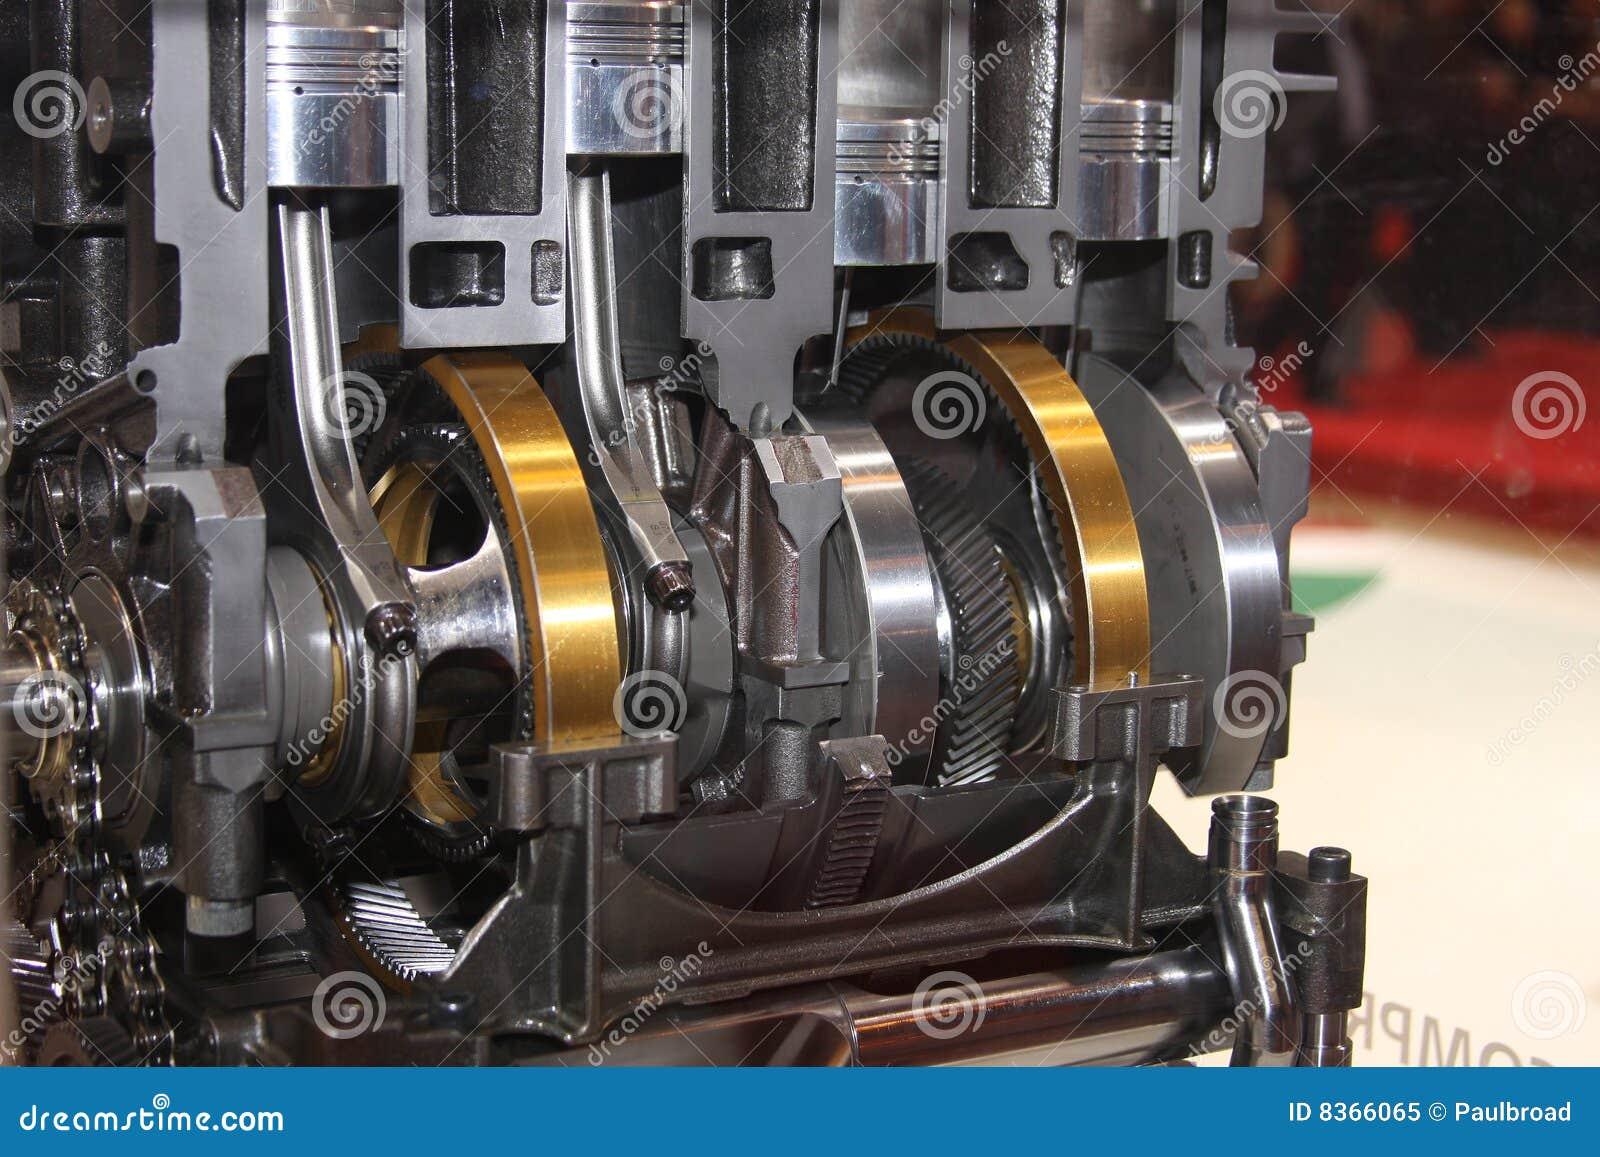 piston in car engine - photo #30